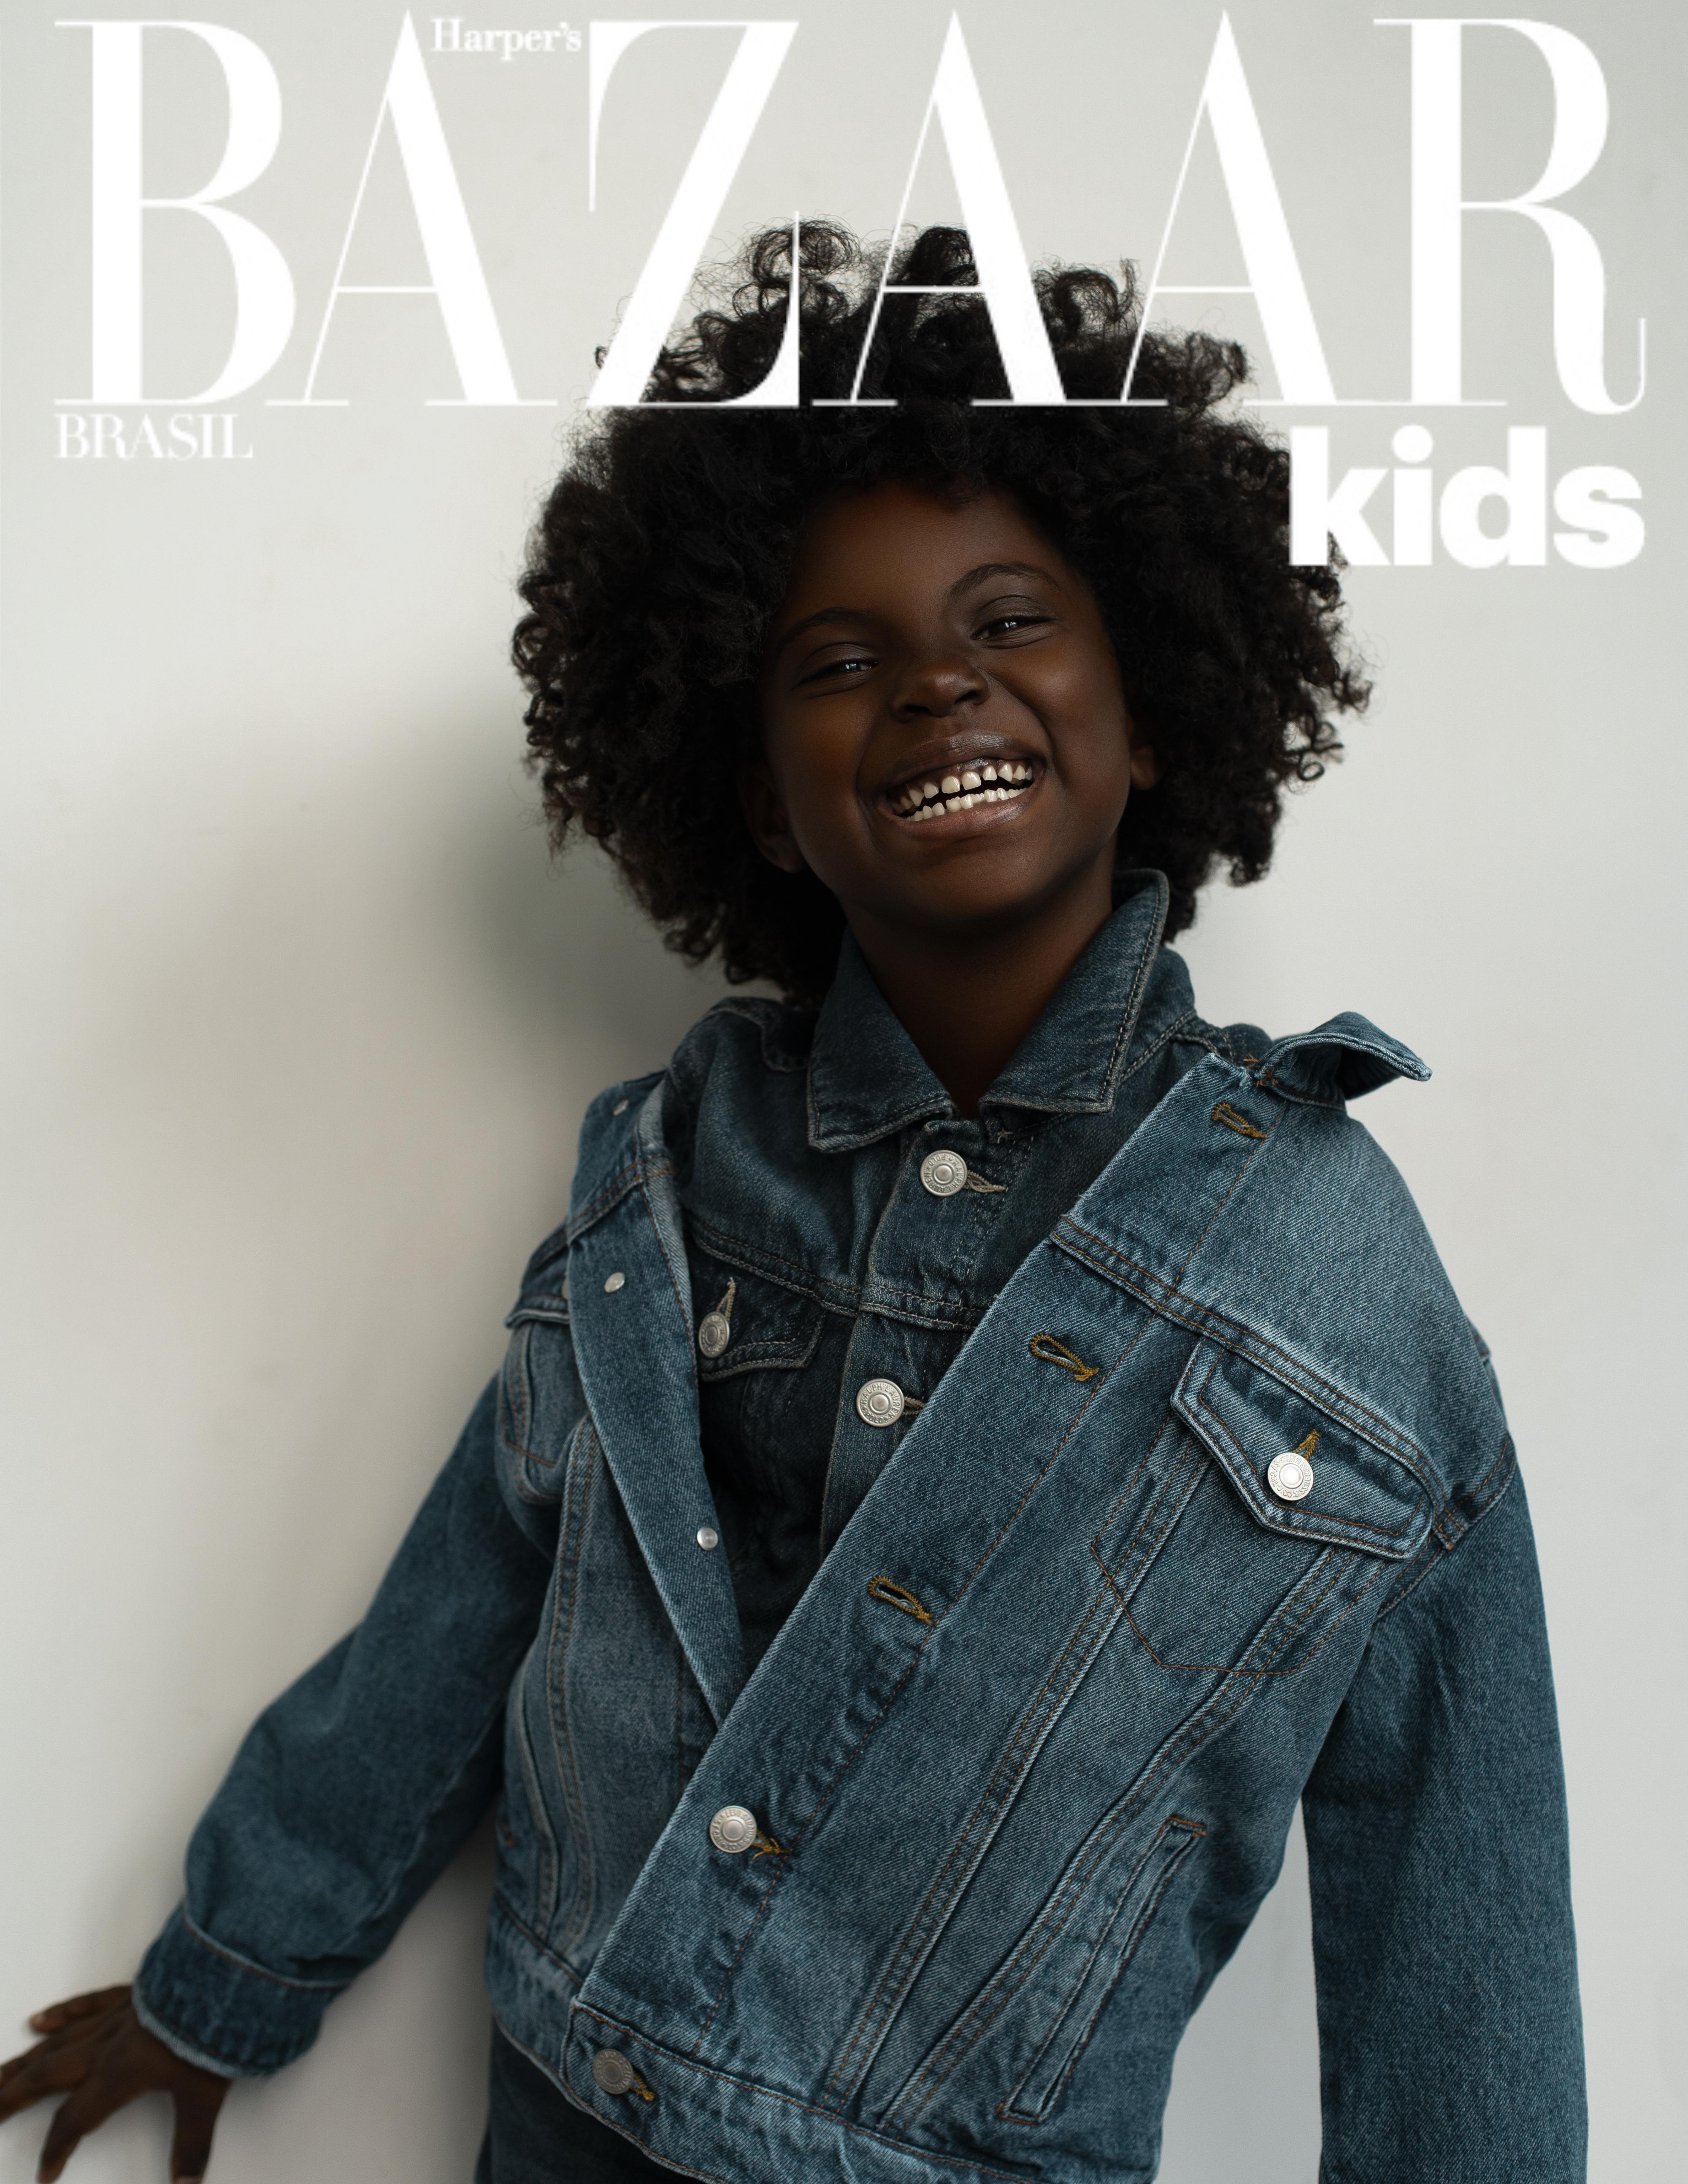 PARKER | Harper's Bazaar Braisl Kids